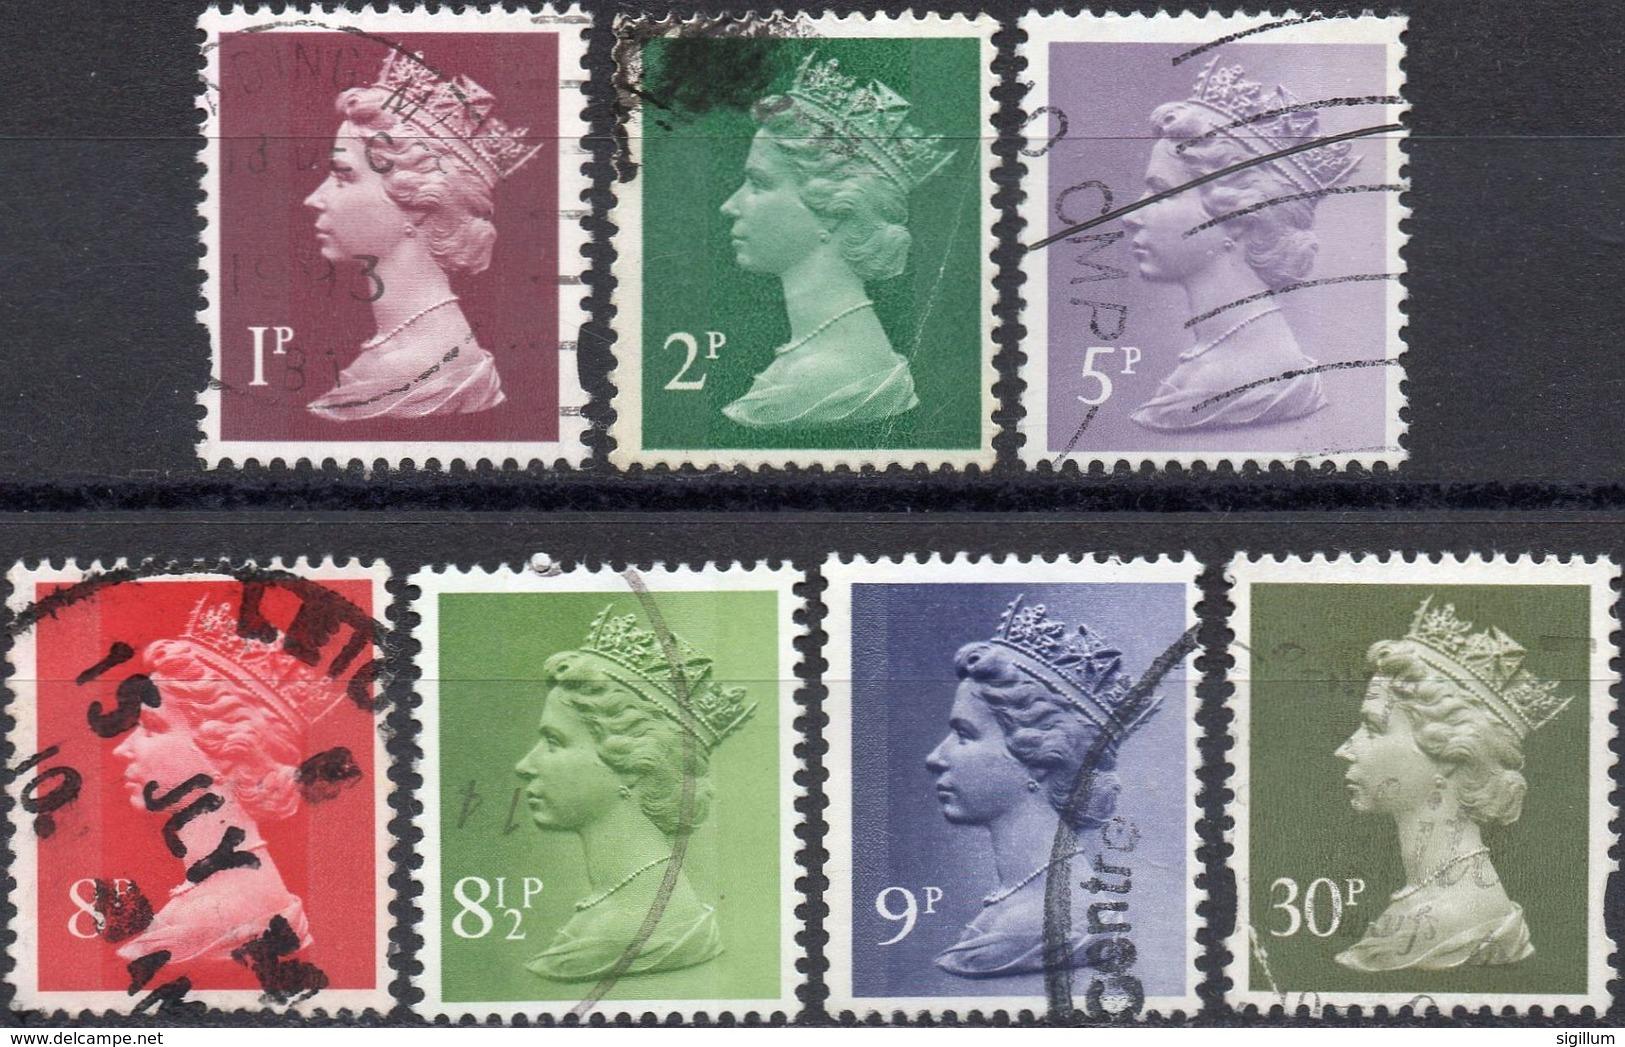 GRAN BRETAGNA 1971/2006 - ELIZABETH II - 7 VALORI USATI - Usati